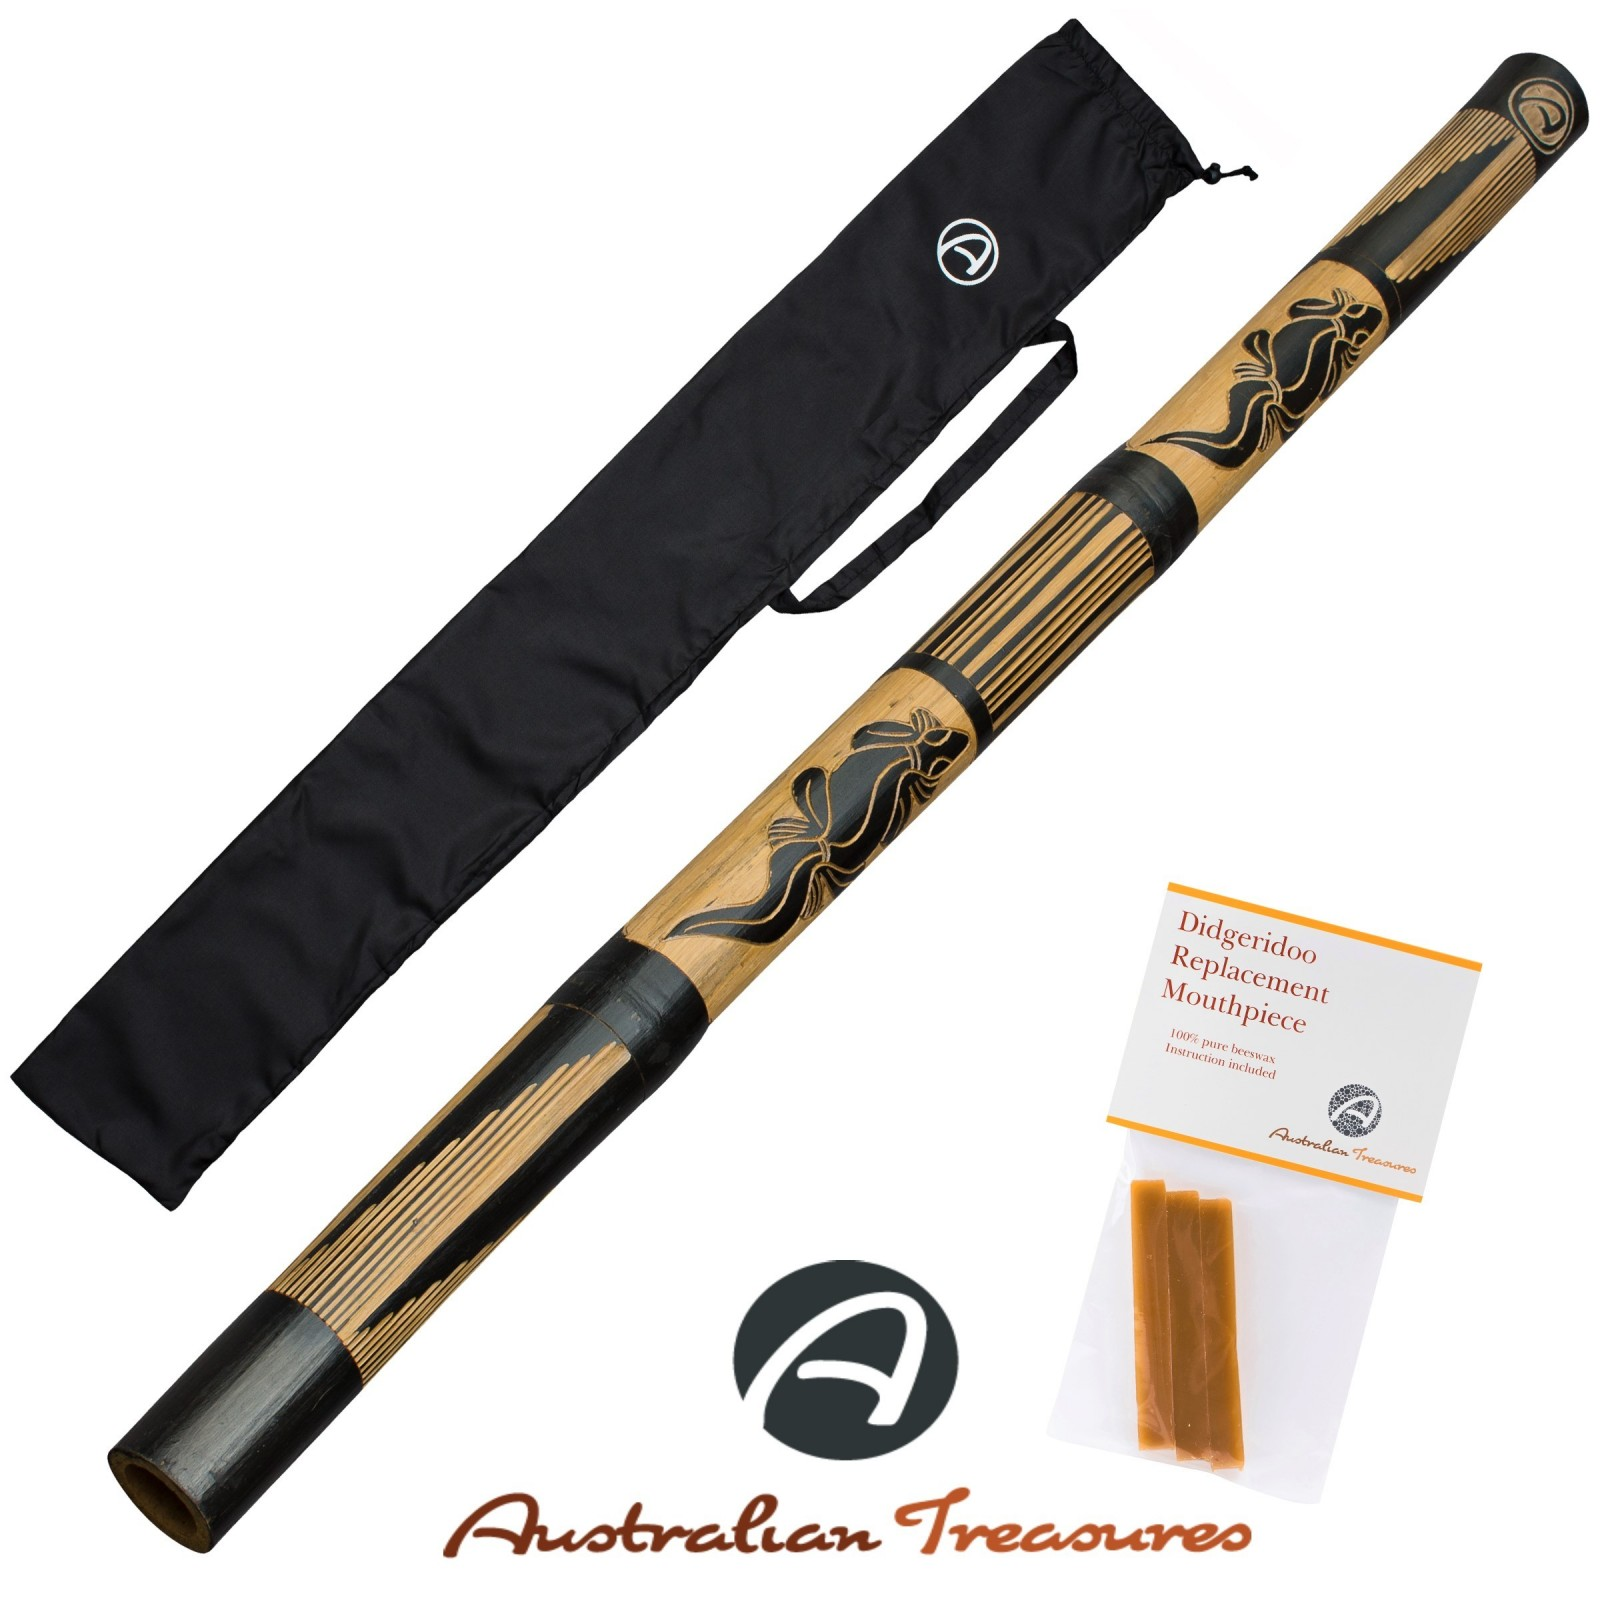 DIDGERIDOO CARVED: didgeridoo bambu con cera d'api e borsa didgeridoo